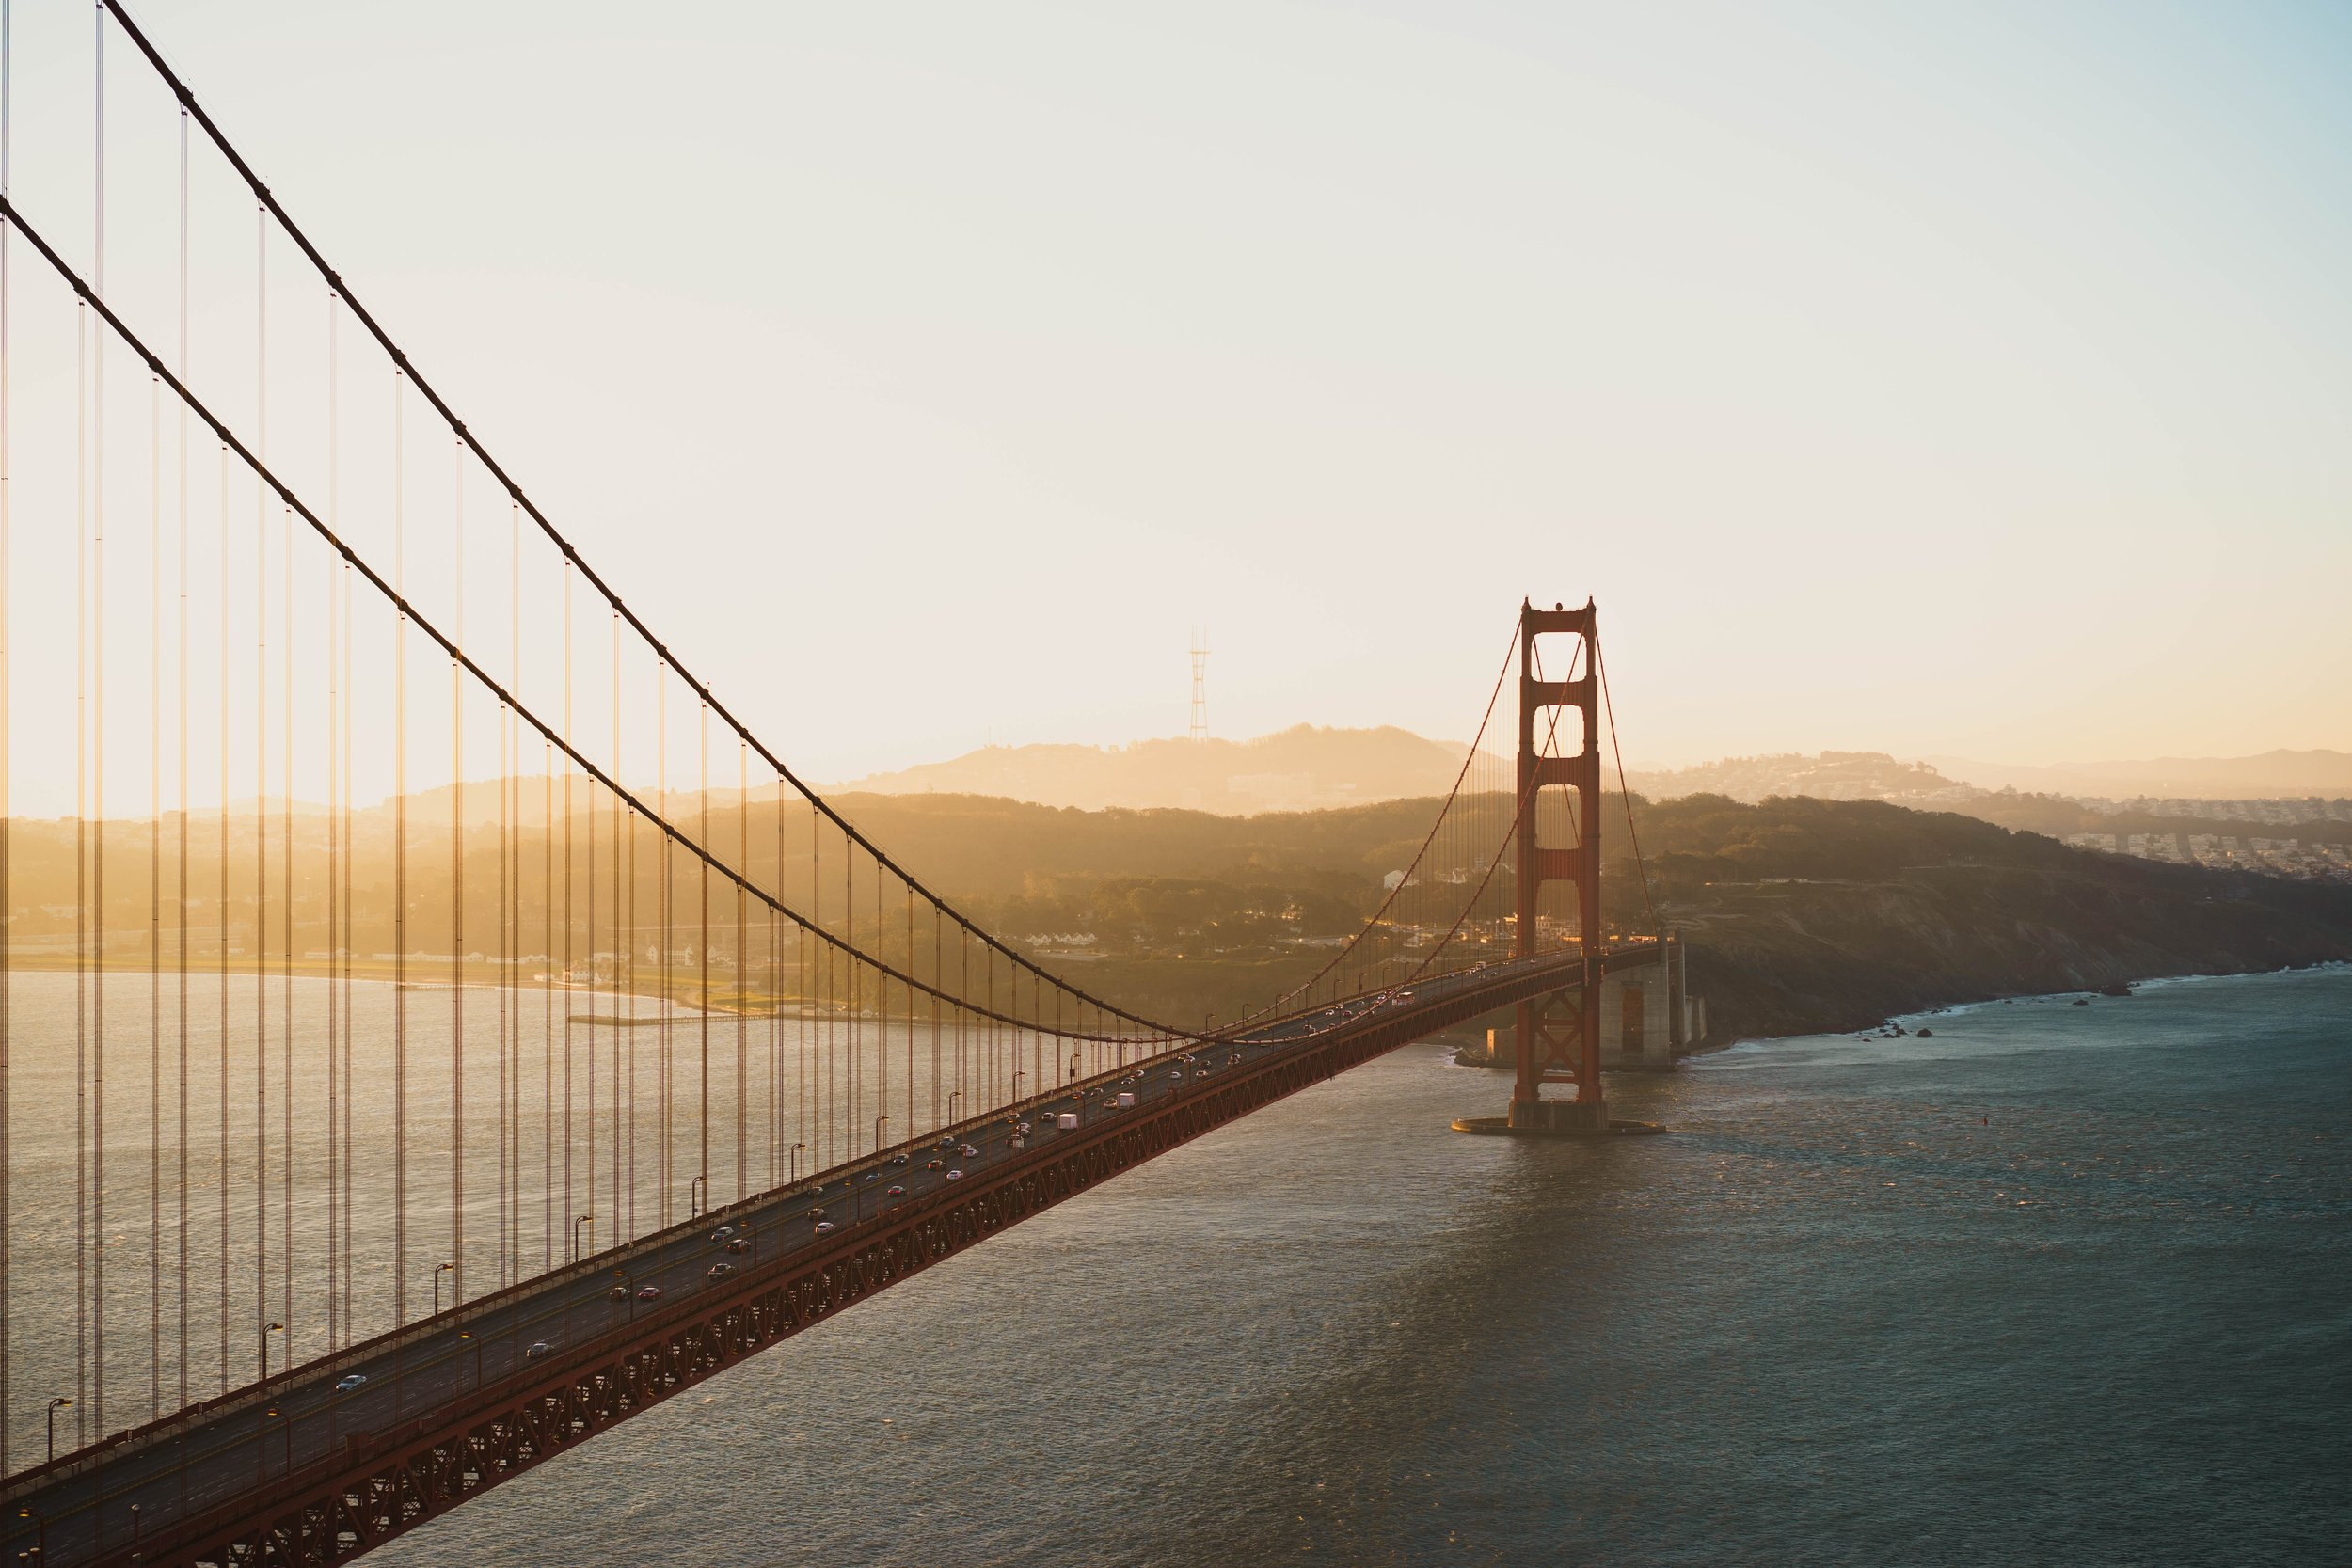 Beautiful shot of the Golden Gate Bridge by    Michael Pechardo